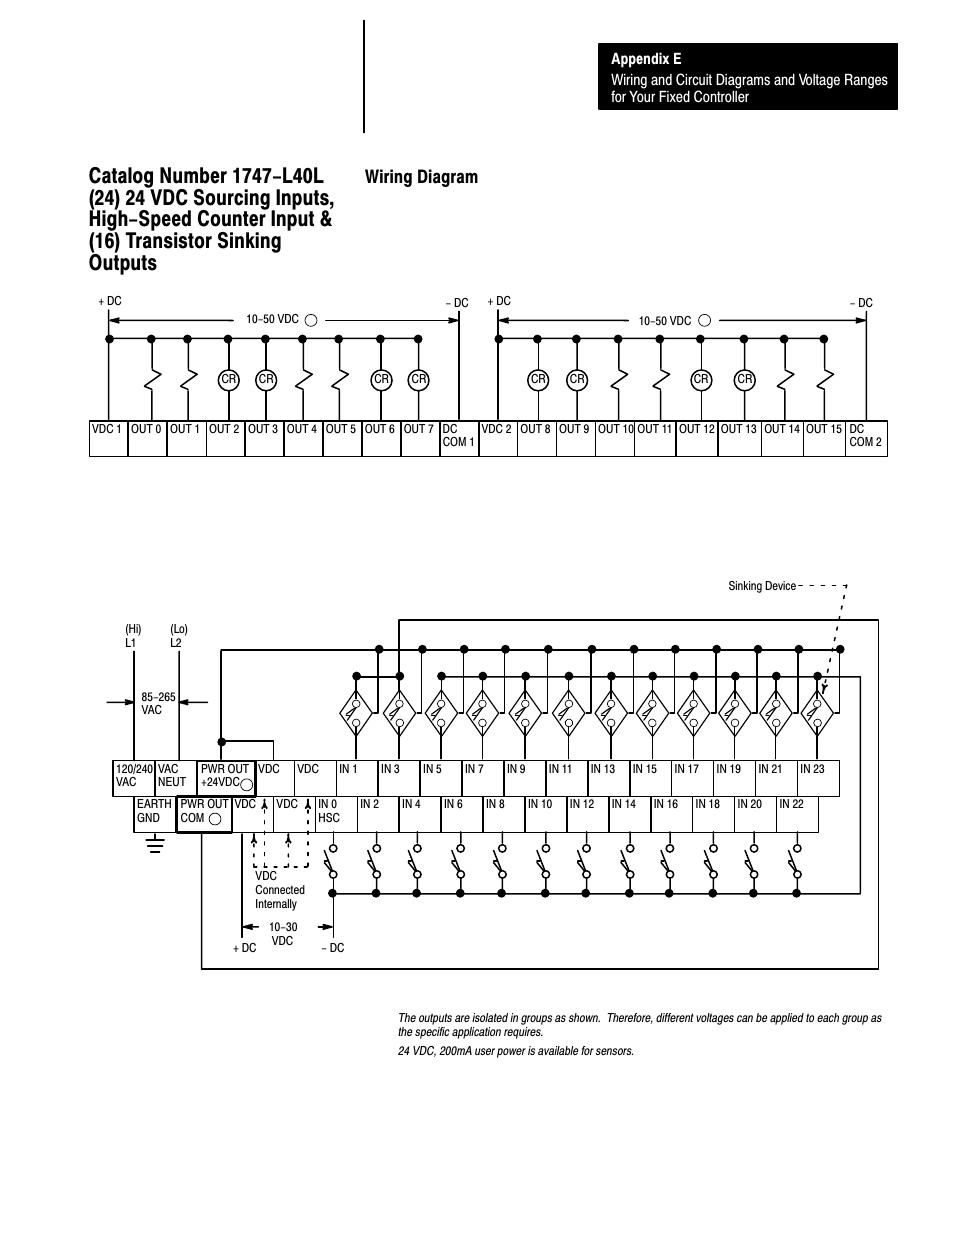 medium resolution of wiring diagram e 61 rockwell automation 1747 l40 slc 500 fixed allen bradley slc 500 wiring diagram slc 500 wiring diagram source slc 500 power supply